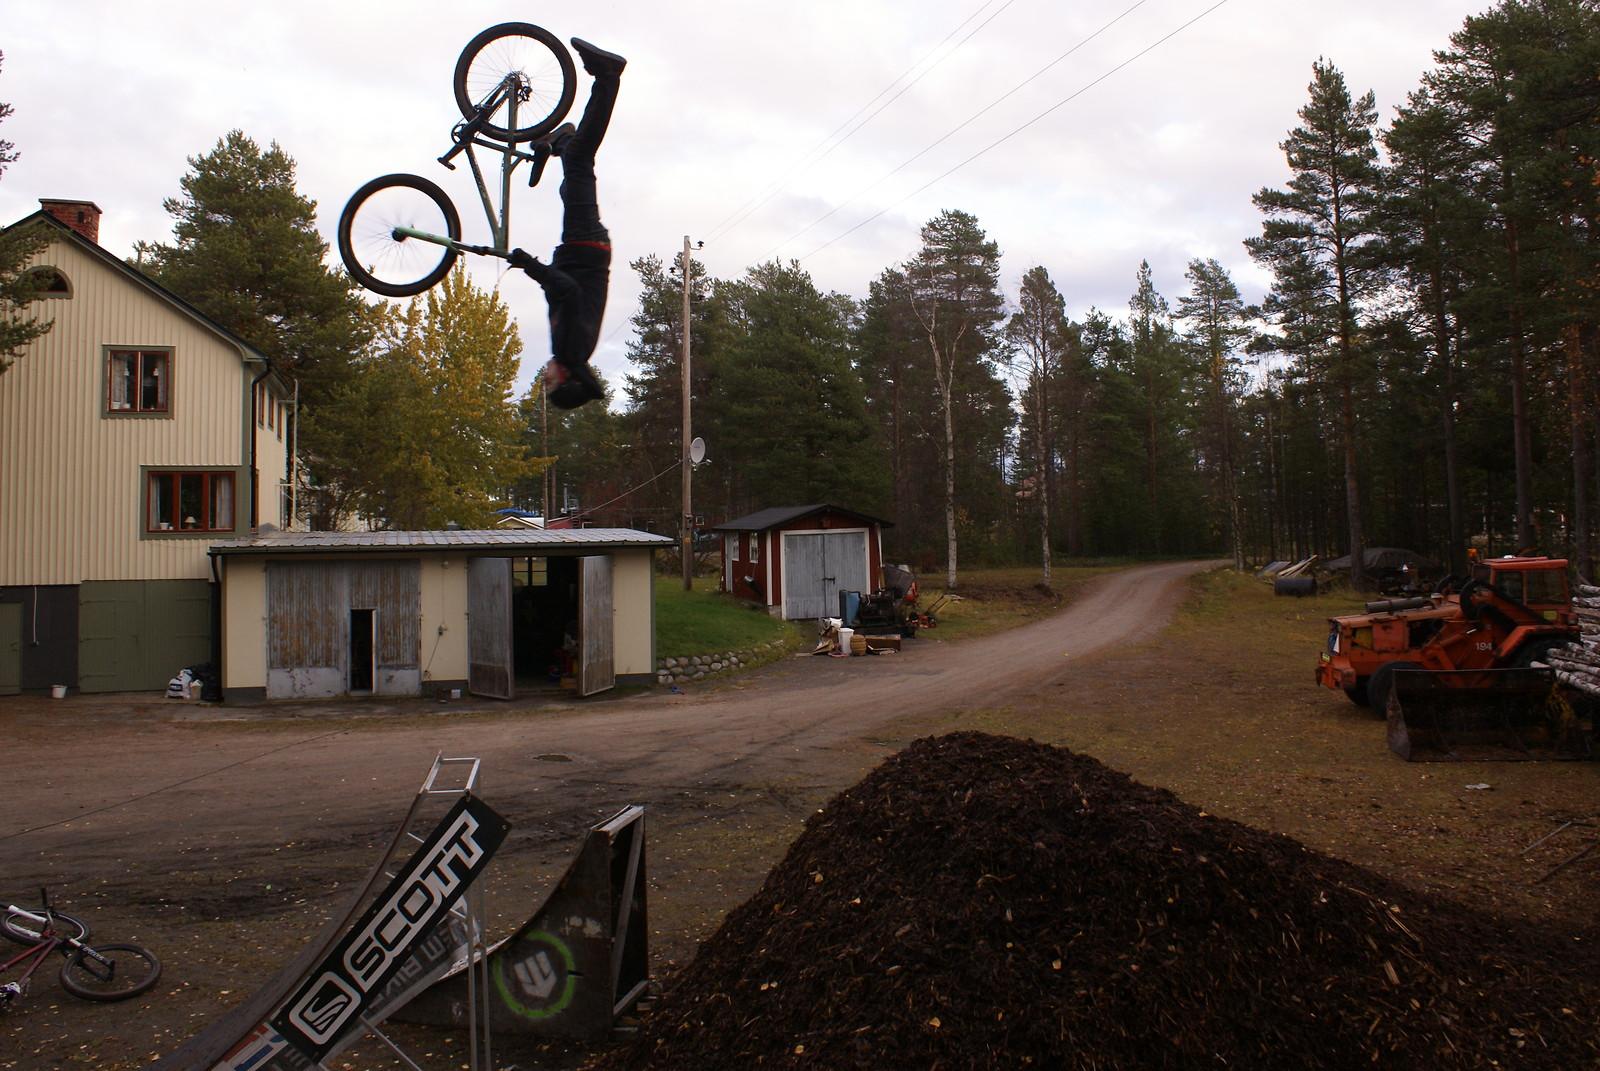 Superflip - Pata - Mountain Biking Pictures - Vital MTB